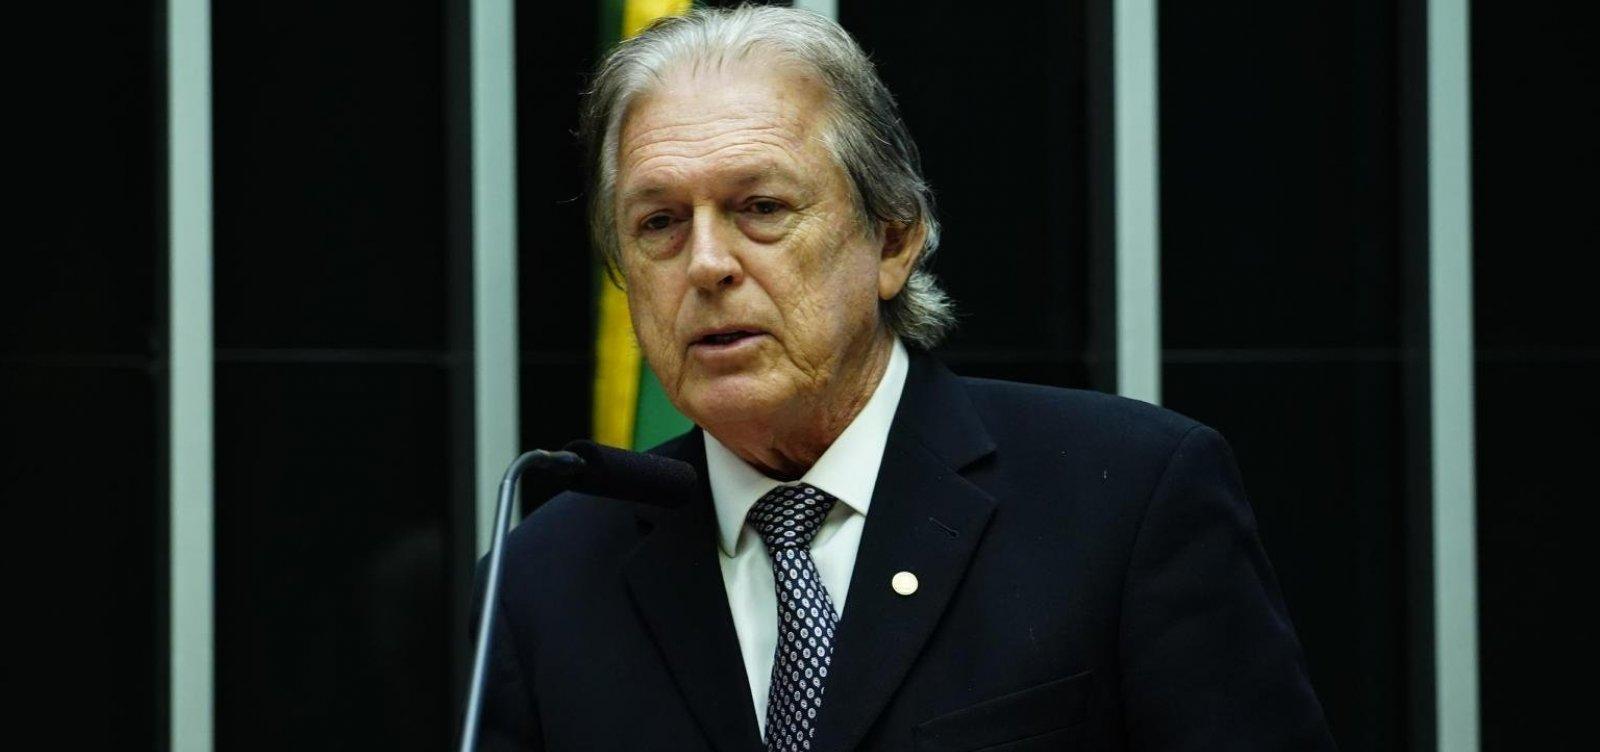 [Presidente do PSL chama manifestações pró-Bolsonaro de 'sem sentido']